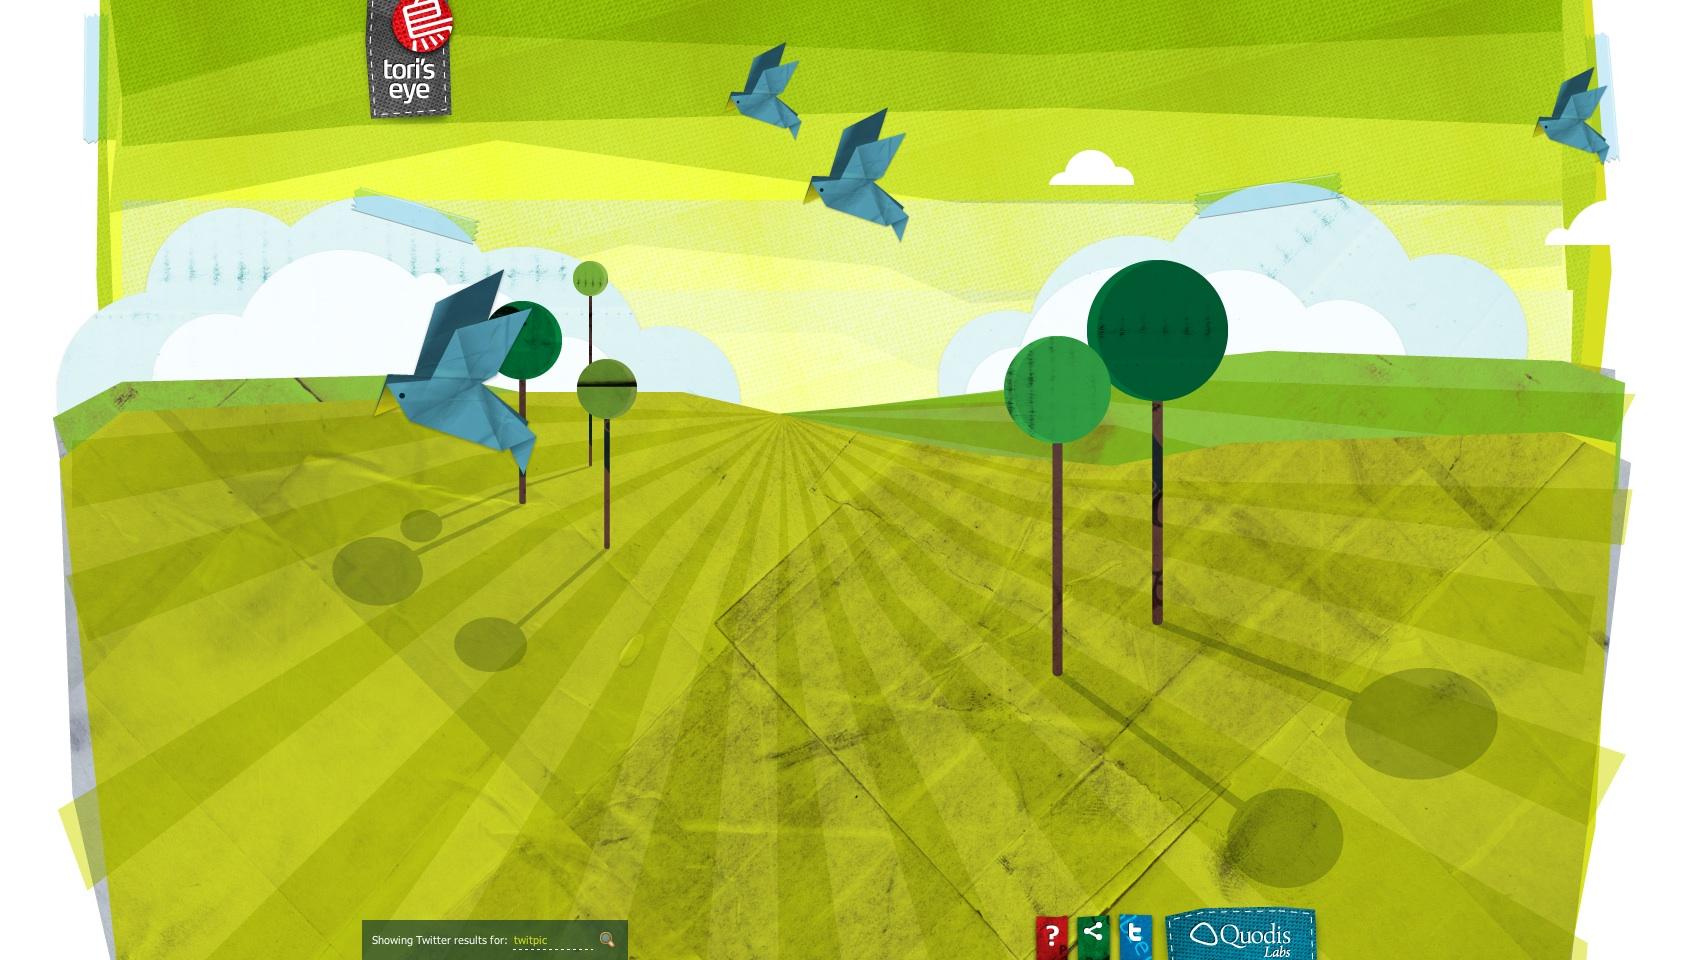 Trend alert: 20 animated website designs